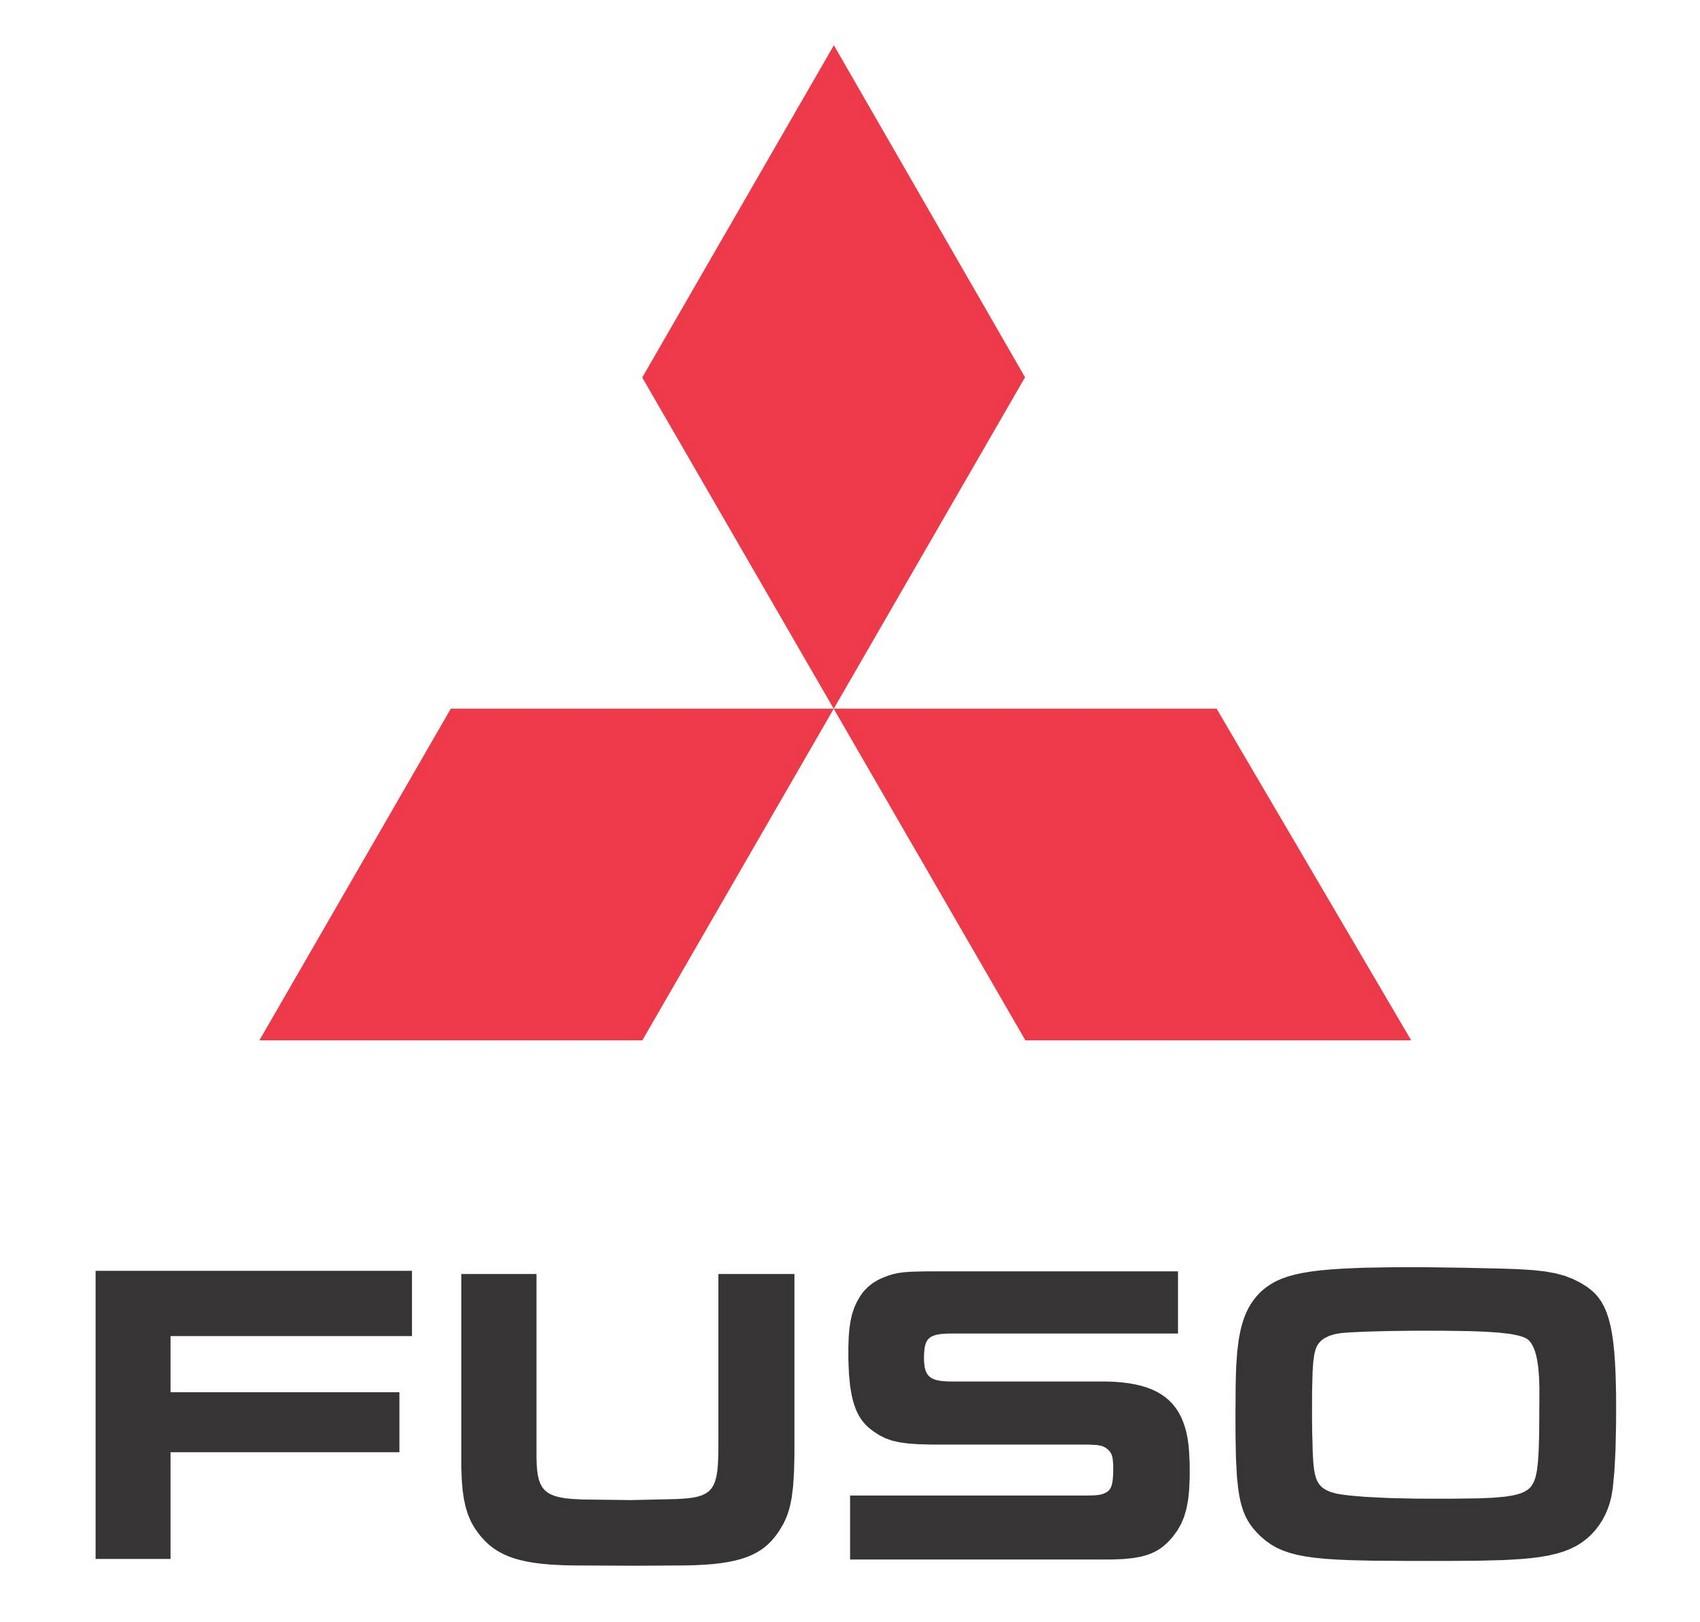 file mitsubishi fuso logo jpg wikimedia commons rh commons wikimedia org hino logo vector hino login